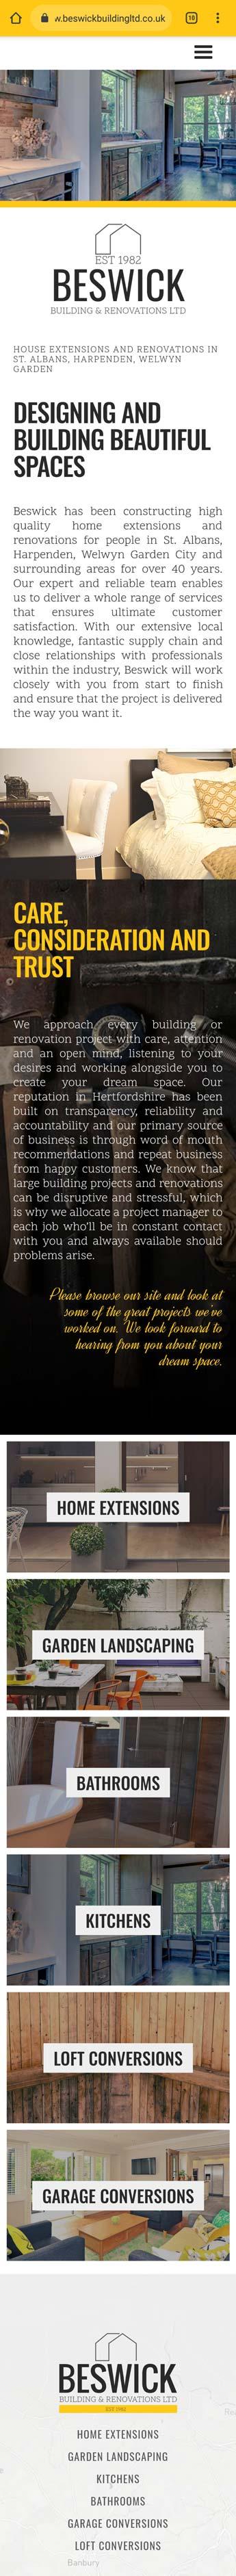 Construction industry website design image